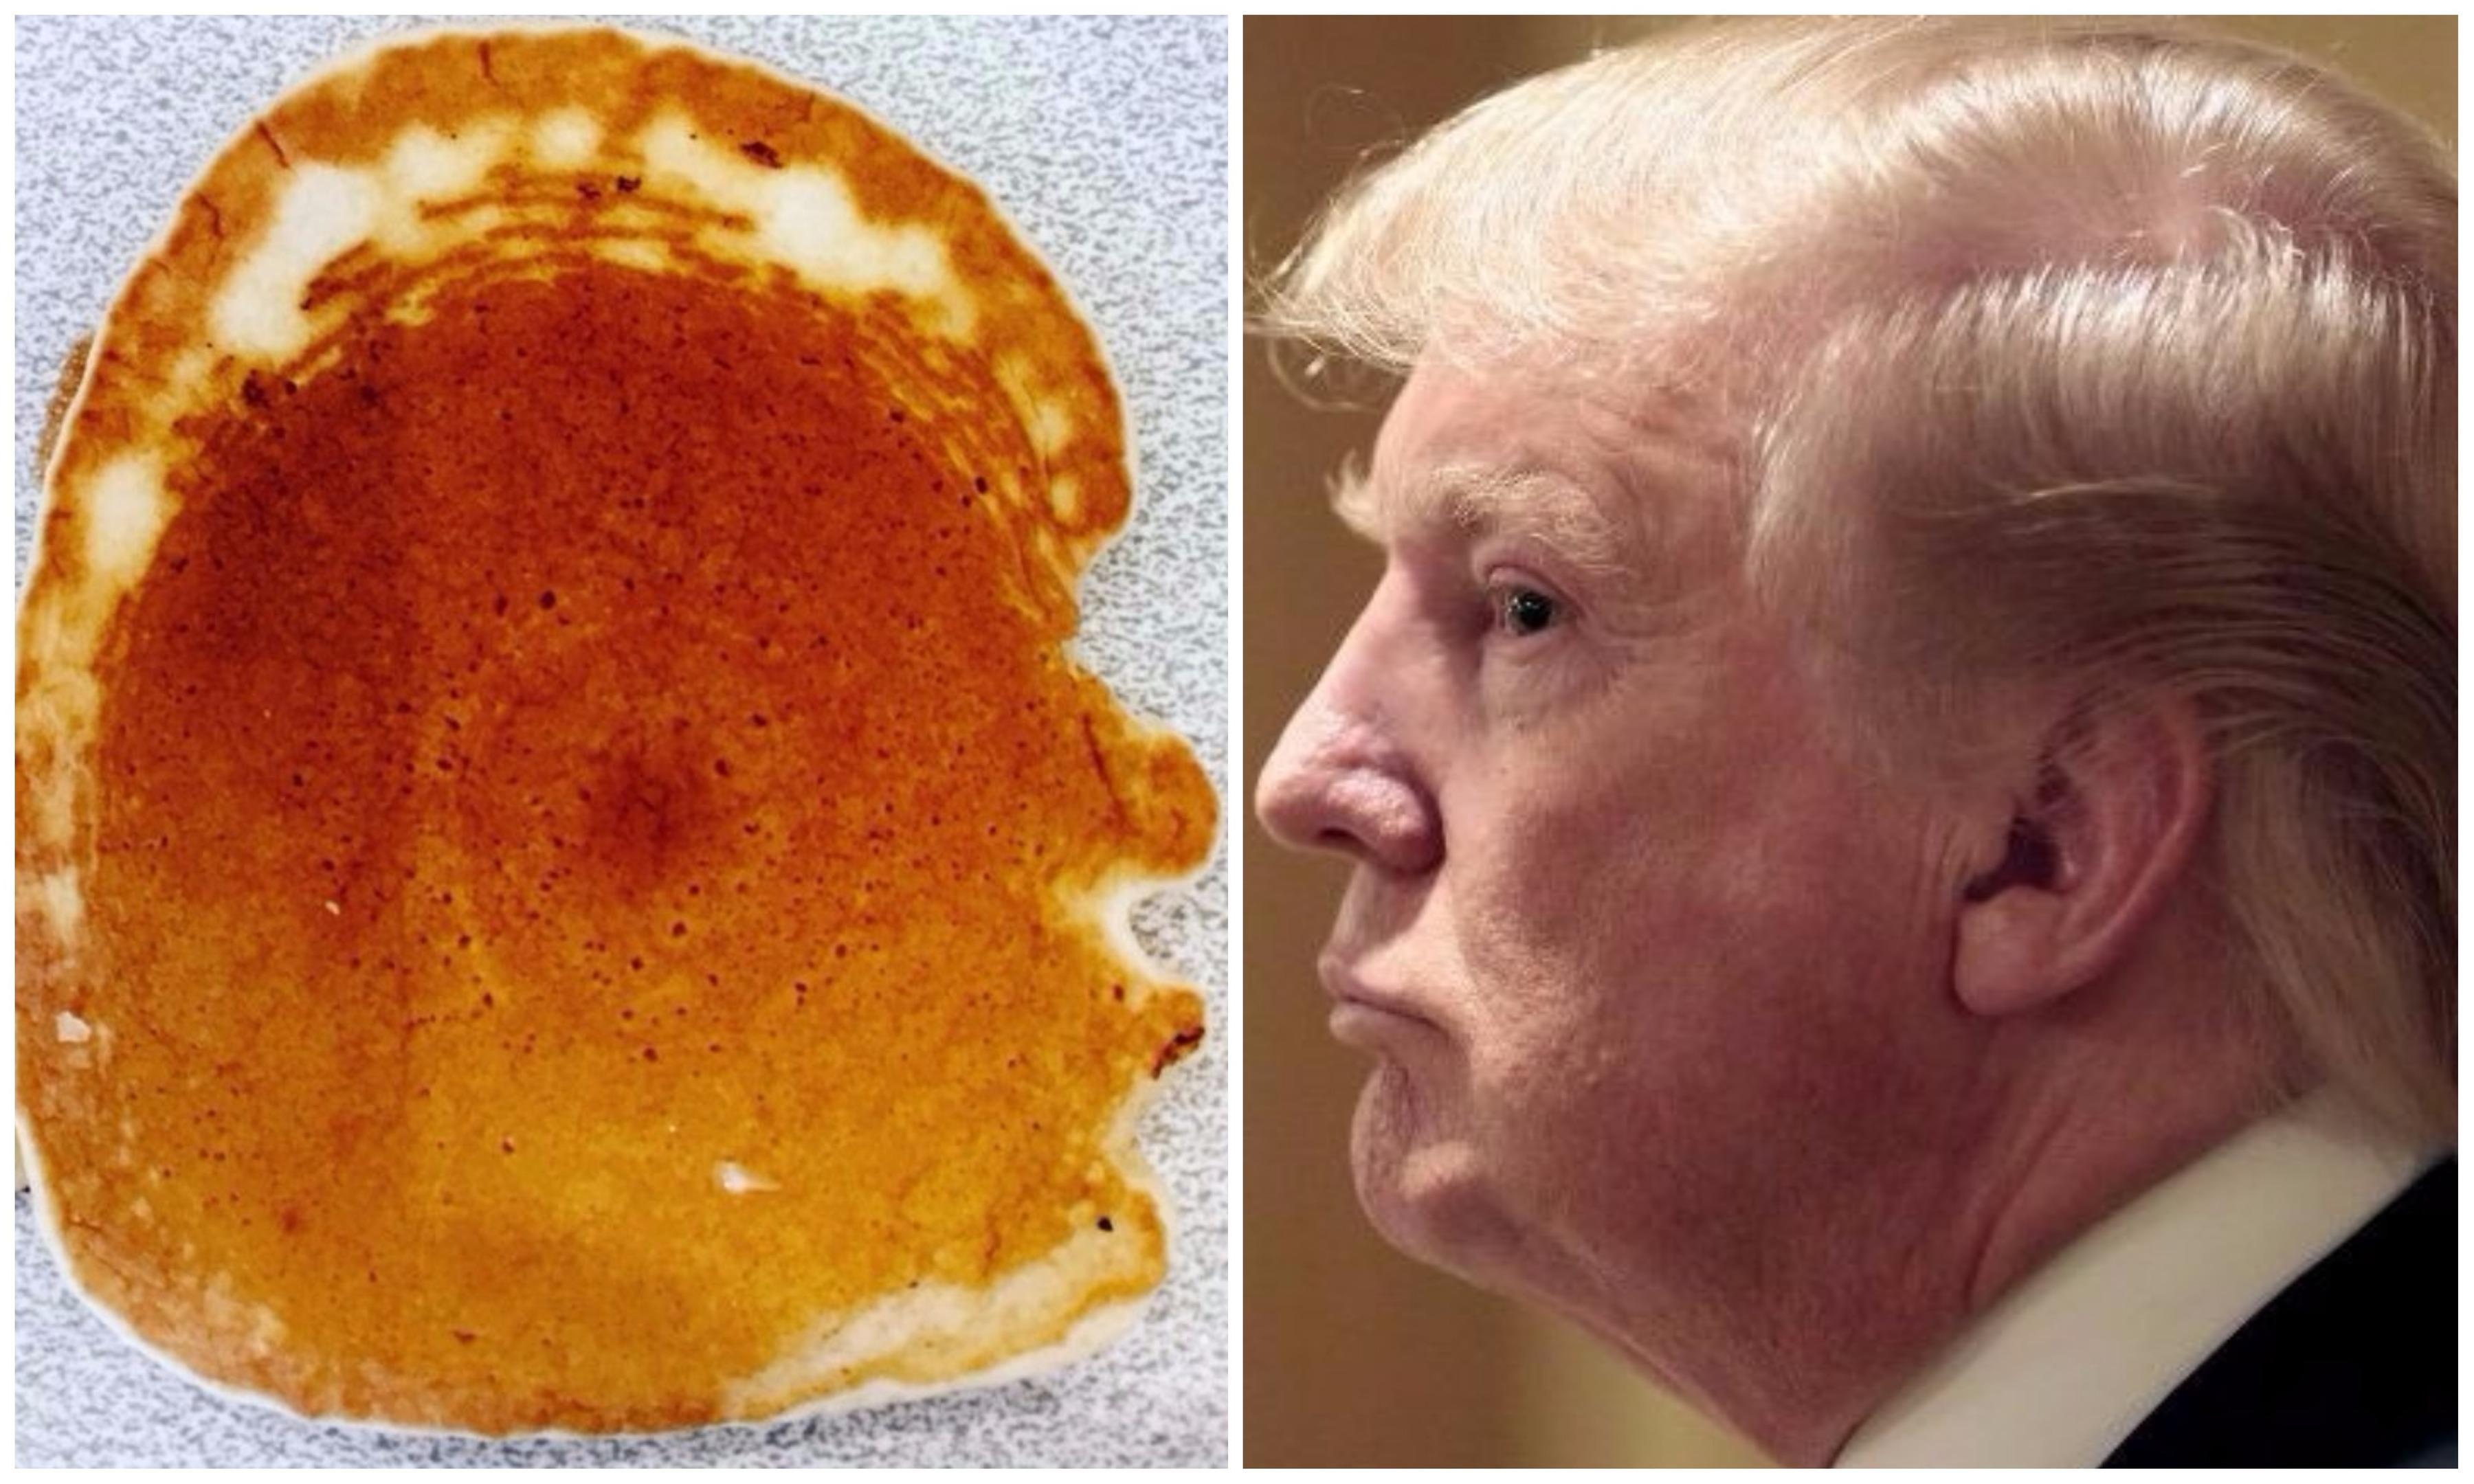 Left: The pancake. Right: the president.